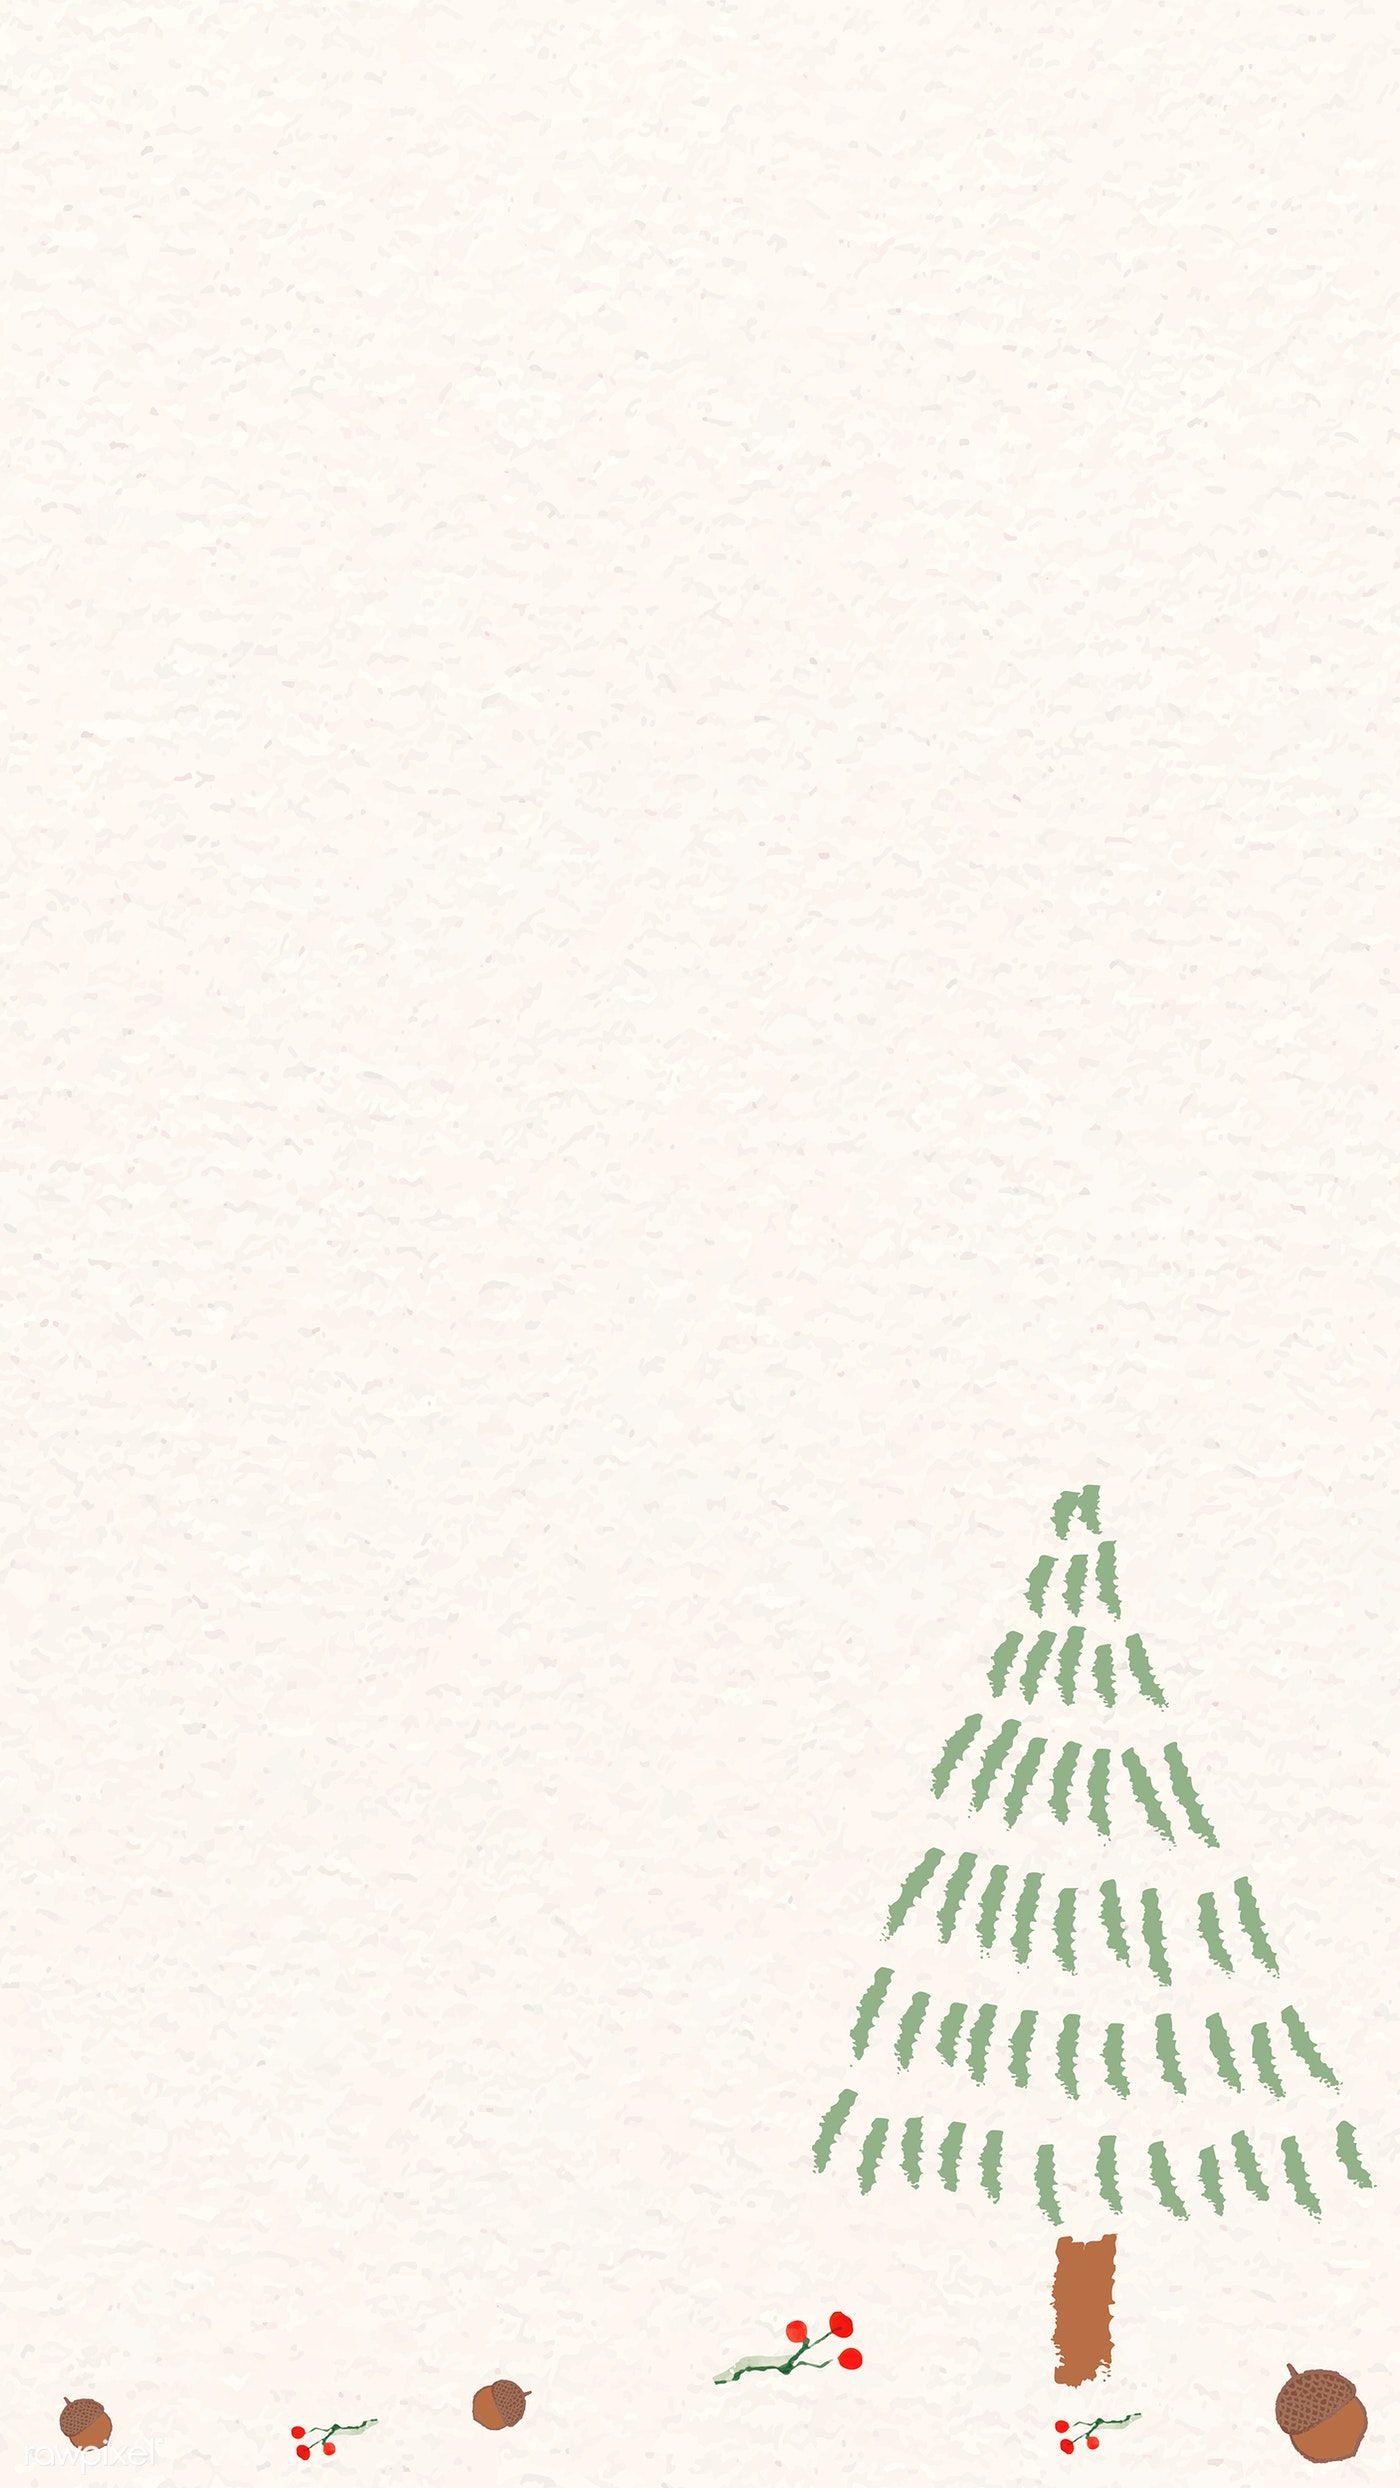 Download Premium Vector Of Christmas Mobile Phone Wallpaper Vector 1228225 Wallpaper Vector Cute Christmas Wallpaper Phone Wallpaper Cute christmas phone wallpaper